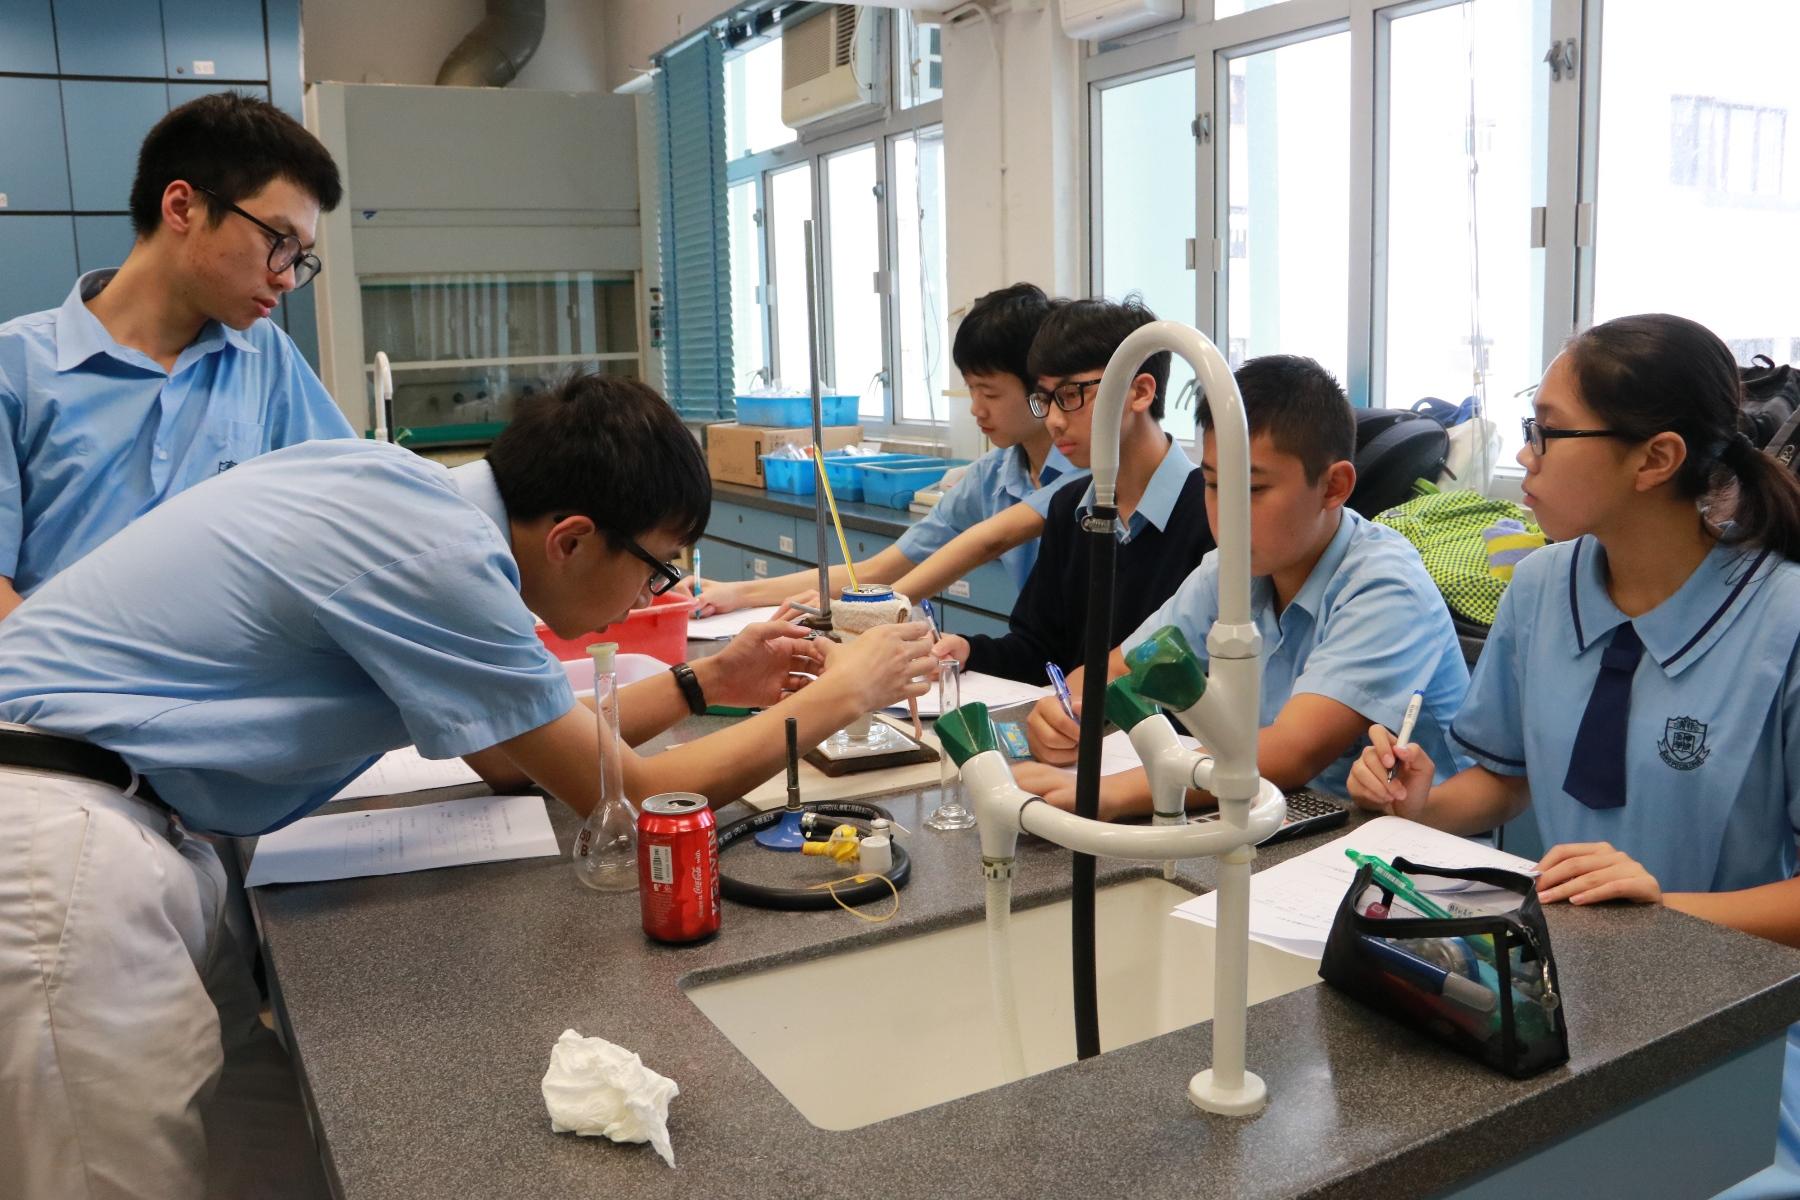 http://www.npc.edu.hk/sites/default/files/img_7504.jpg